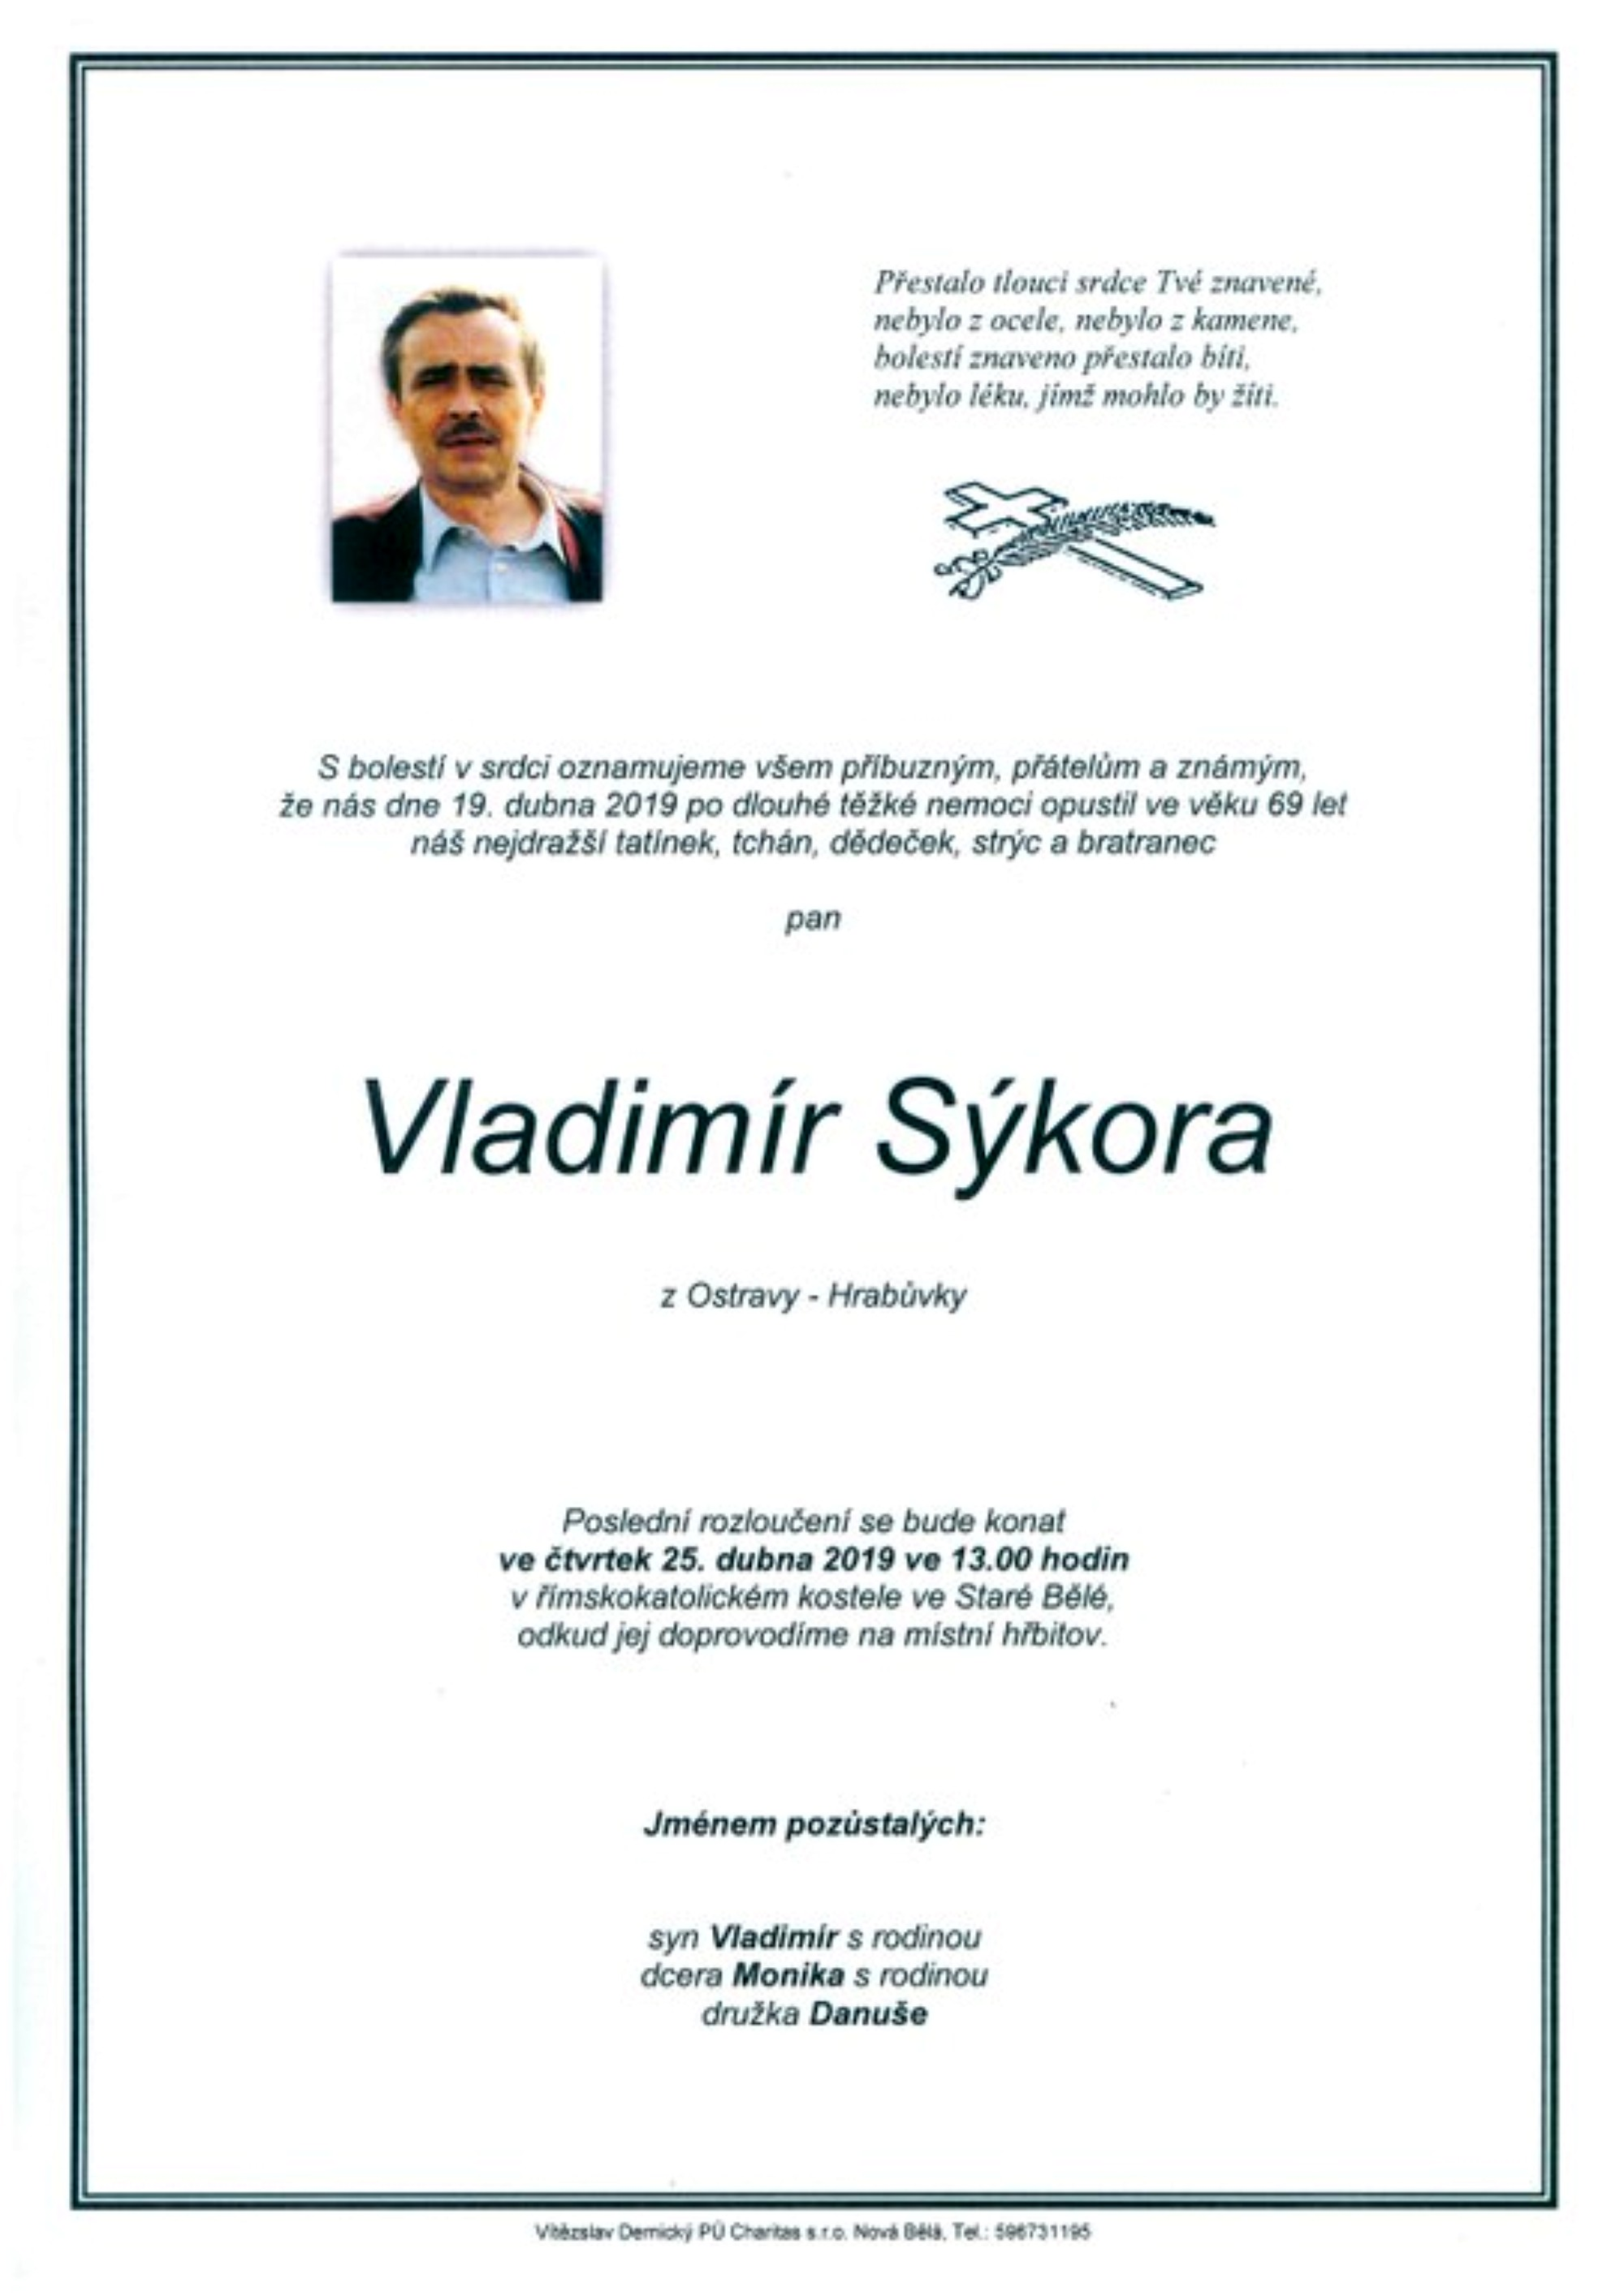 Vladimír Sýkora